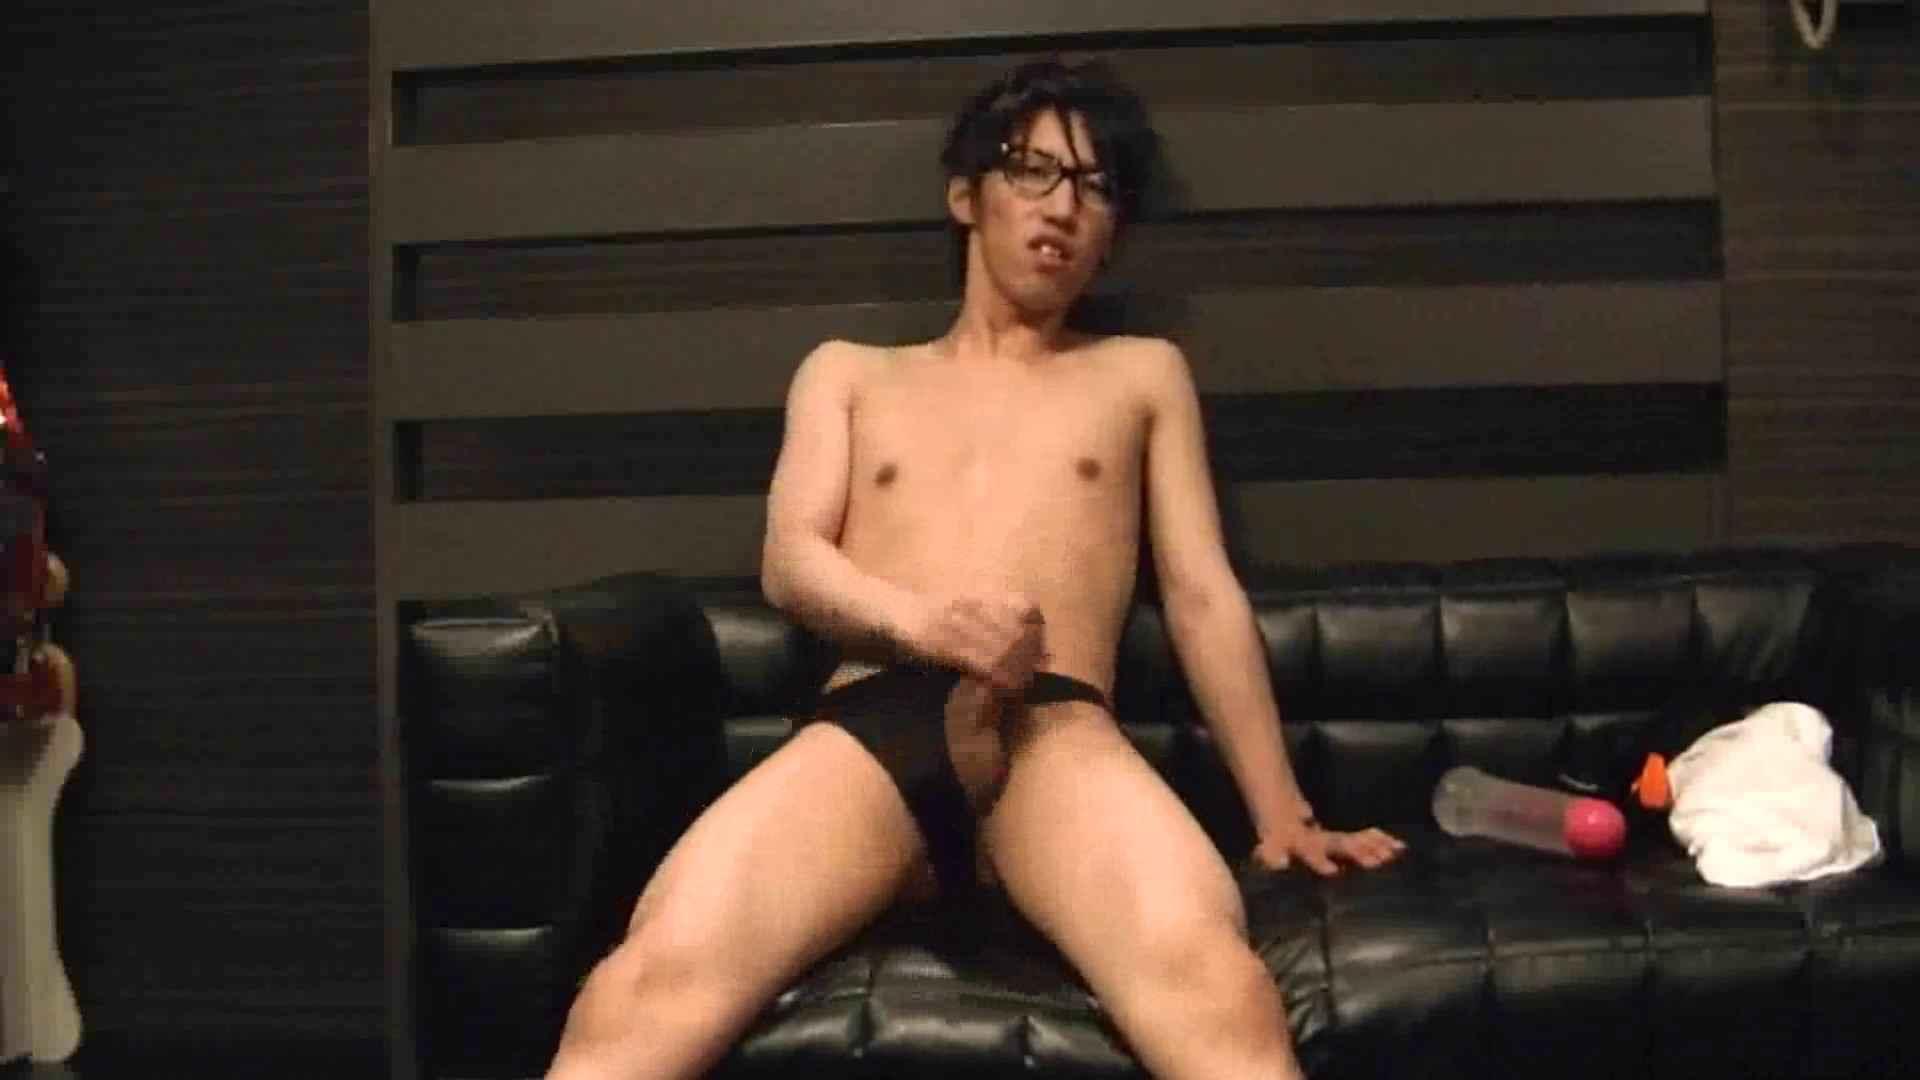 ONA見せカーニバル!! Vol3 男  93pic 92